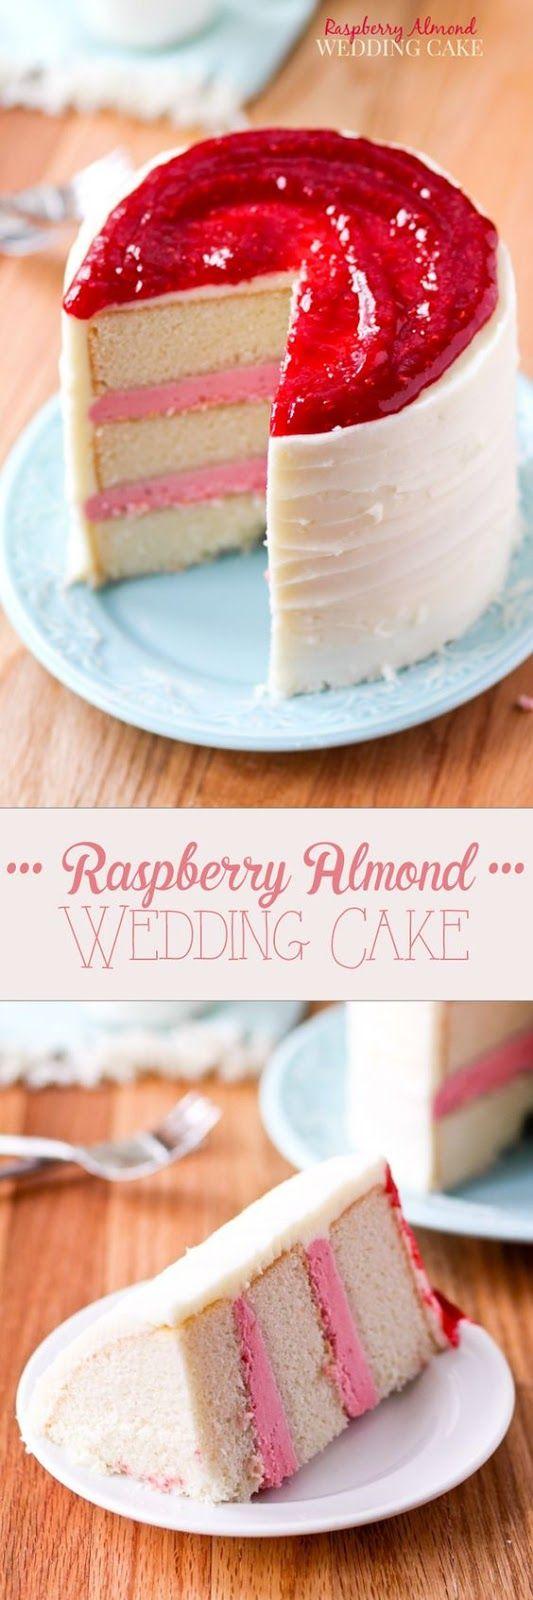 Raspberry Almond Wedding Cake   Food And Cake Recipes